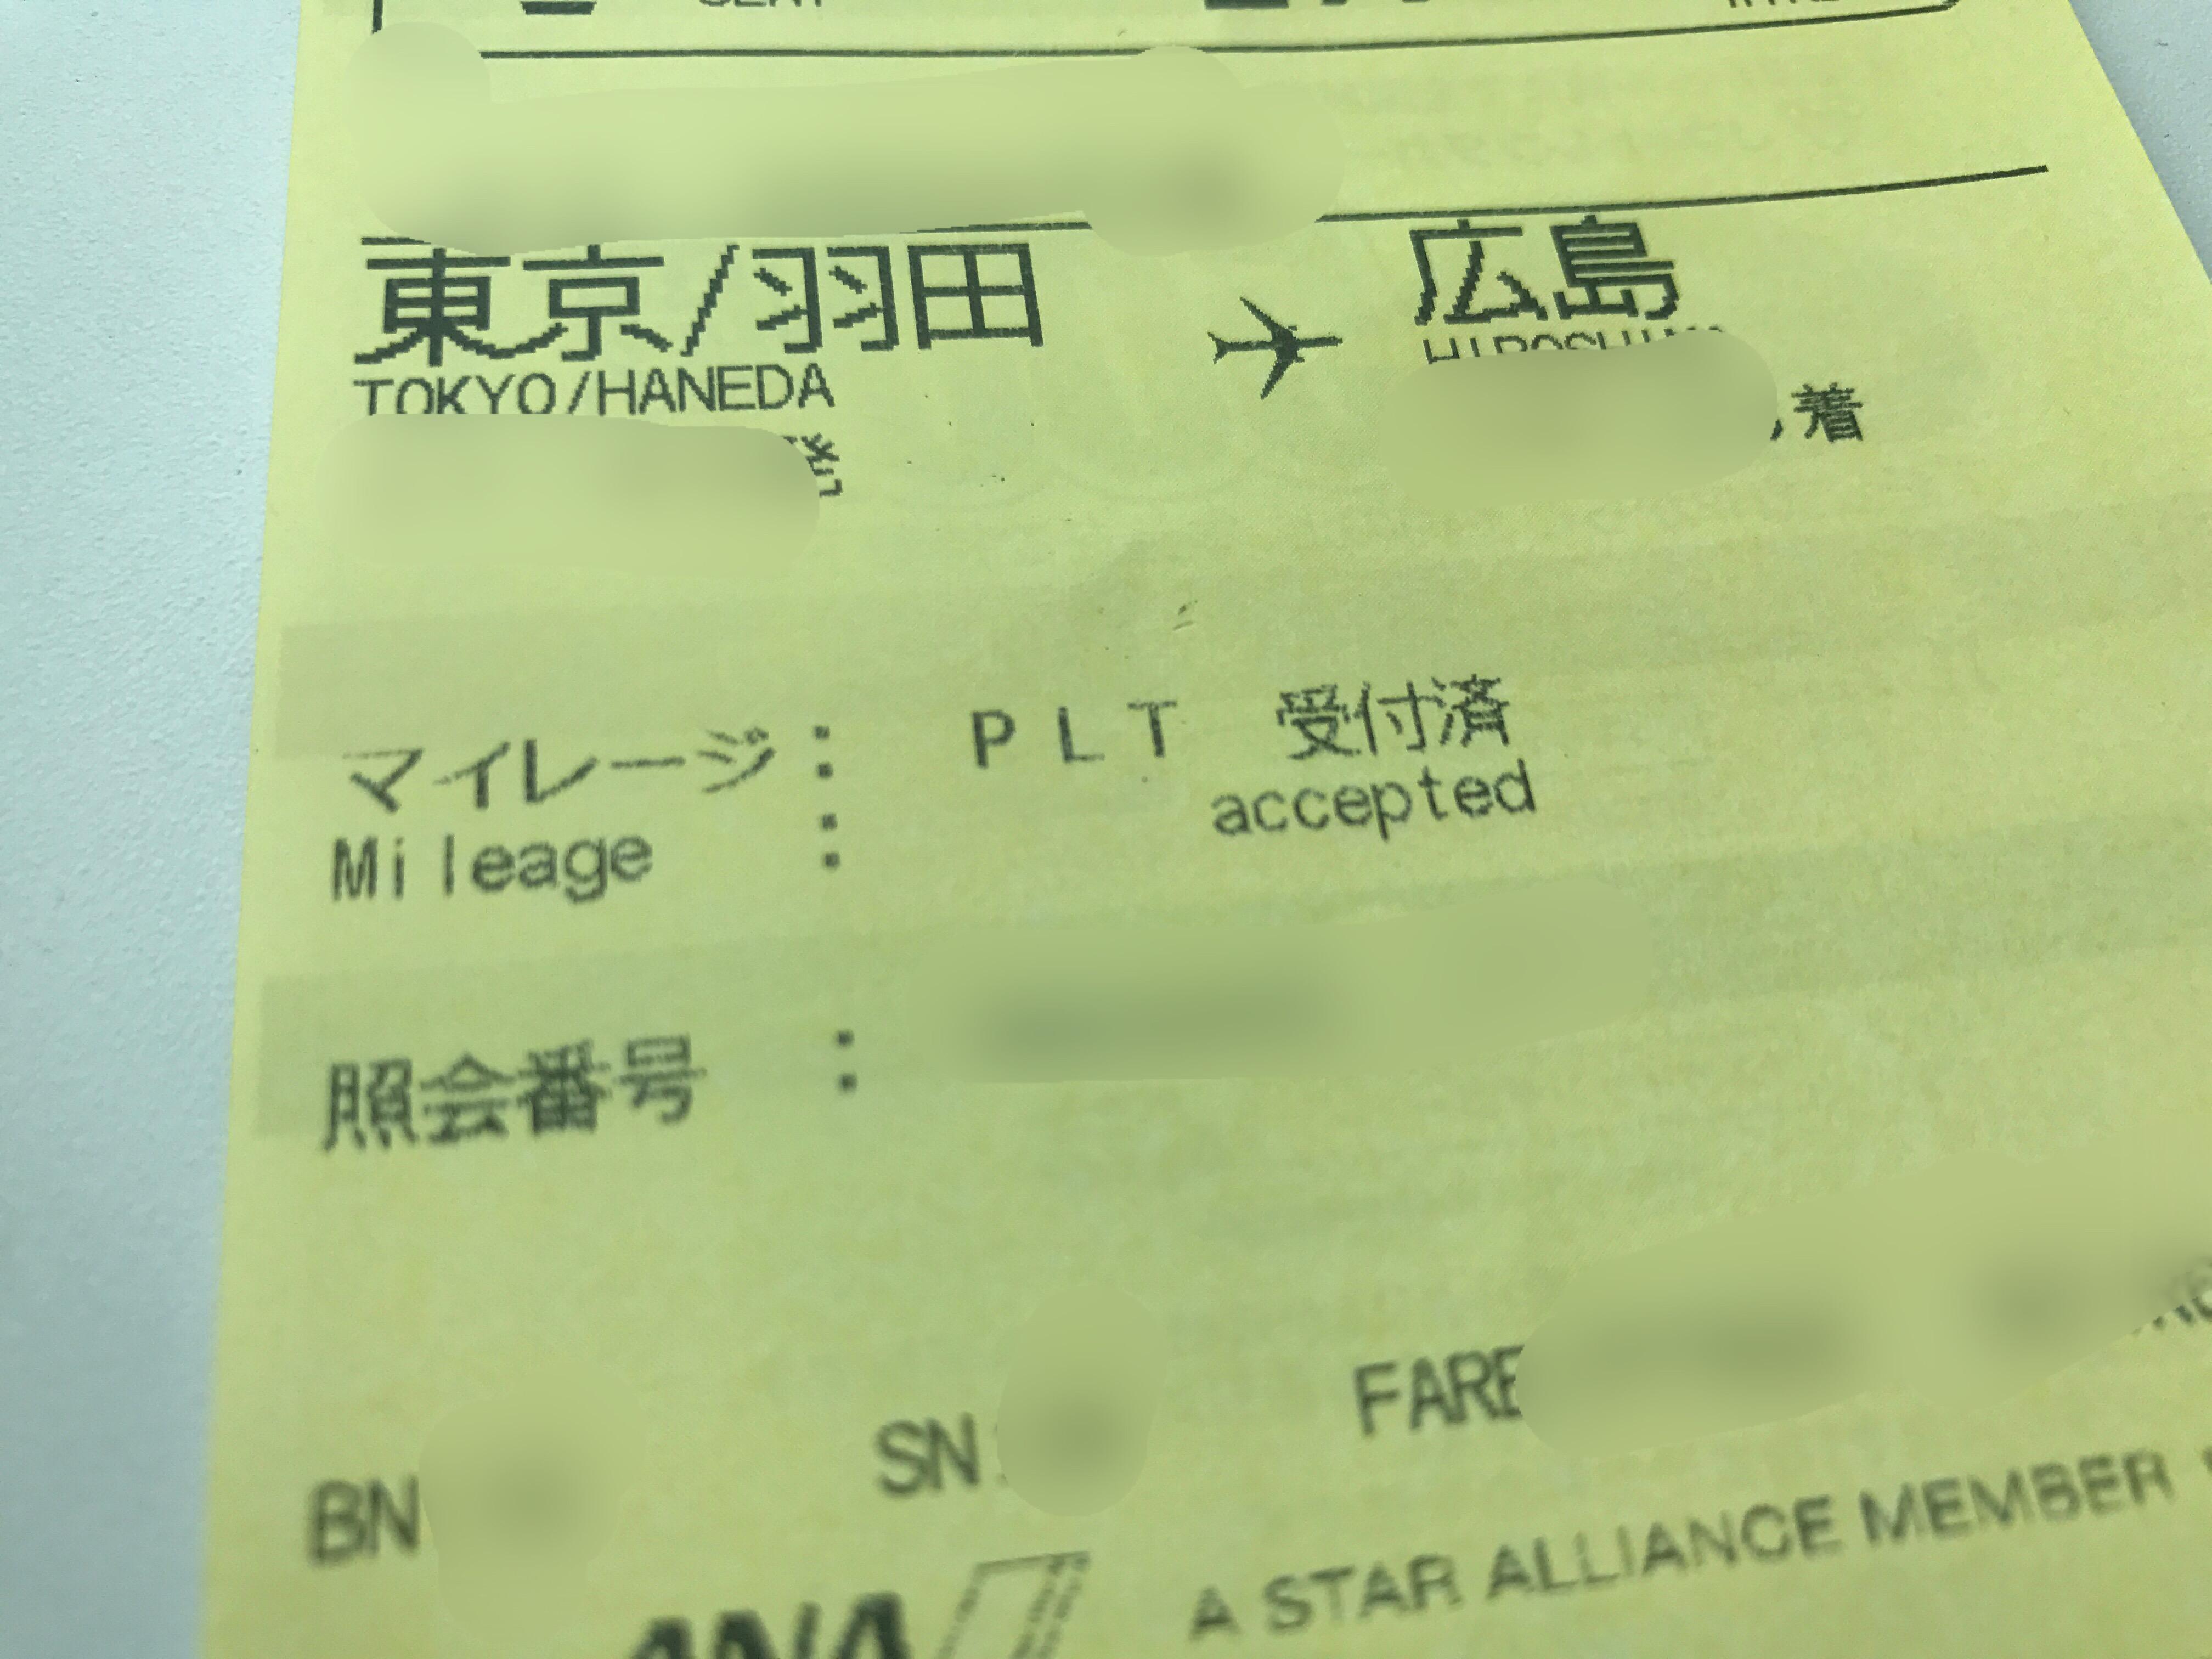 ANA平会員からプラチナメンバーに!メンバーステータス昇格後、搭乗する際に気を付けるべきたった一つのこと